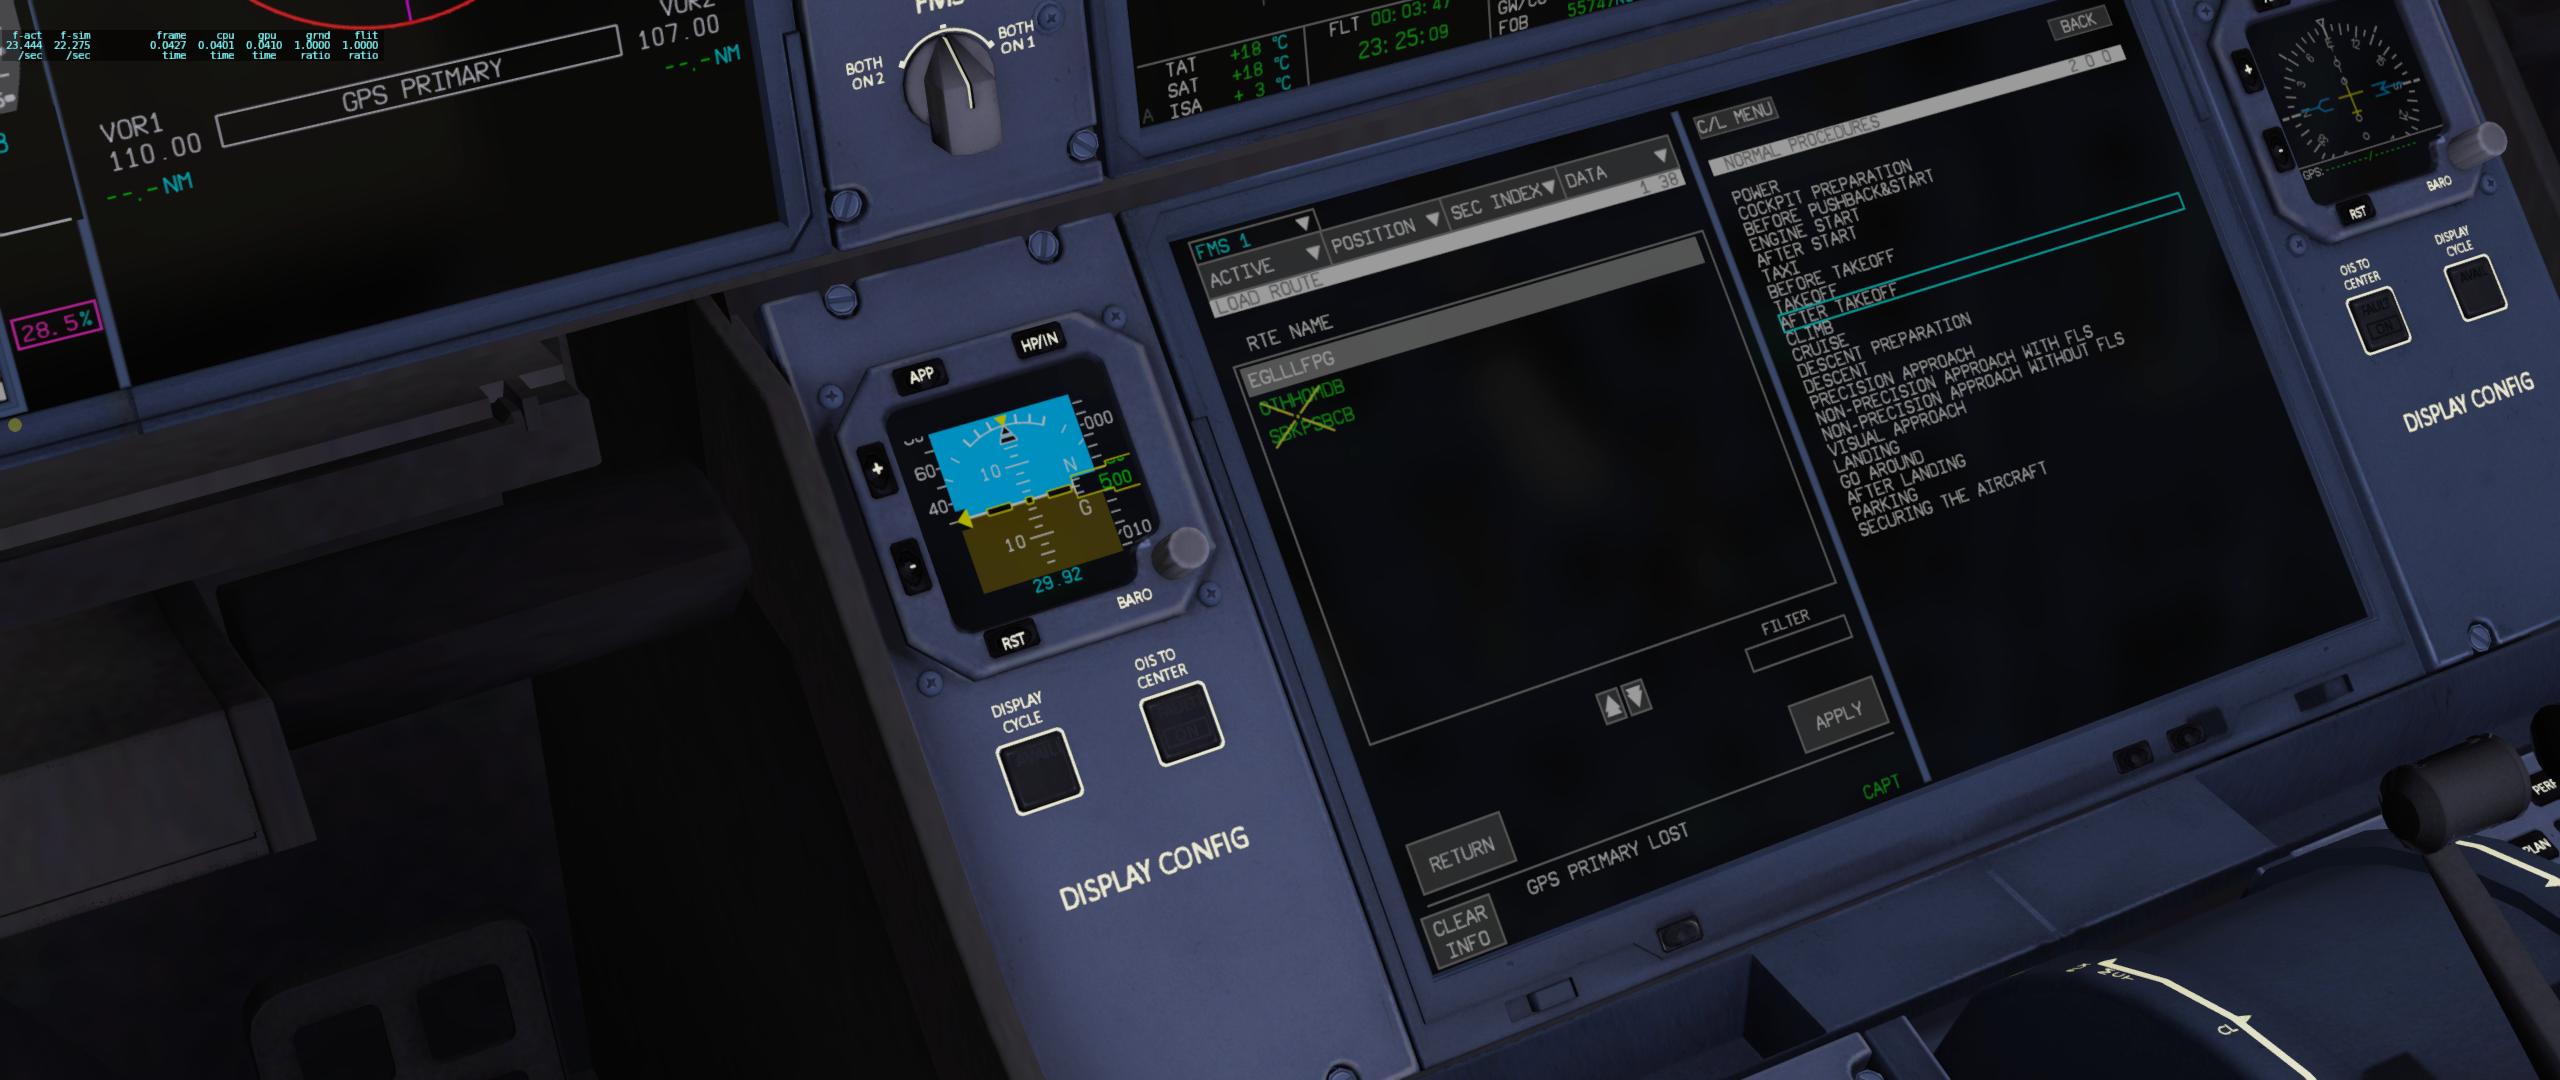 Problema com A350 FlighFactor Screenshot-26-05-2020-20-25-09